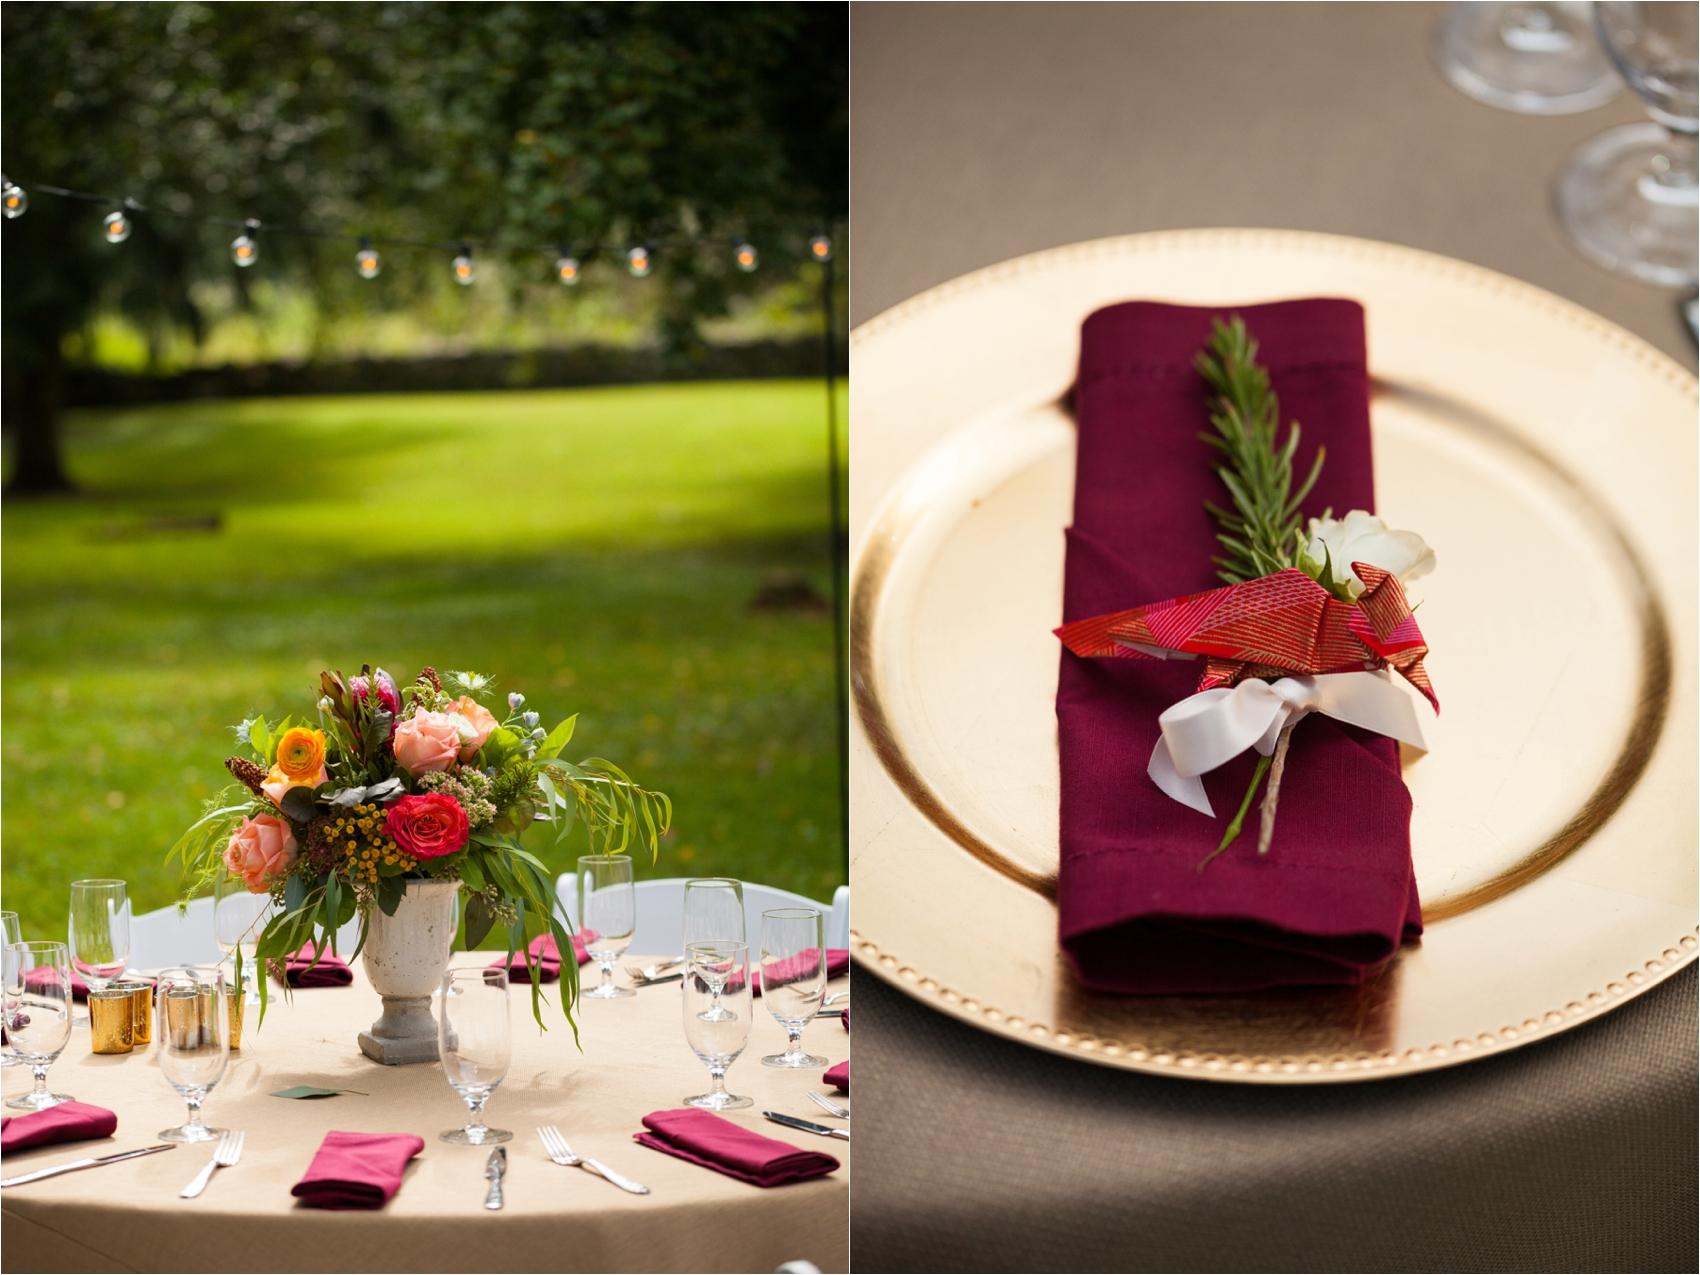 Feather-and-Oak-Rainforest-Trust-Virginia-Wedding-3726.jpg